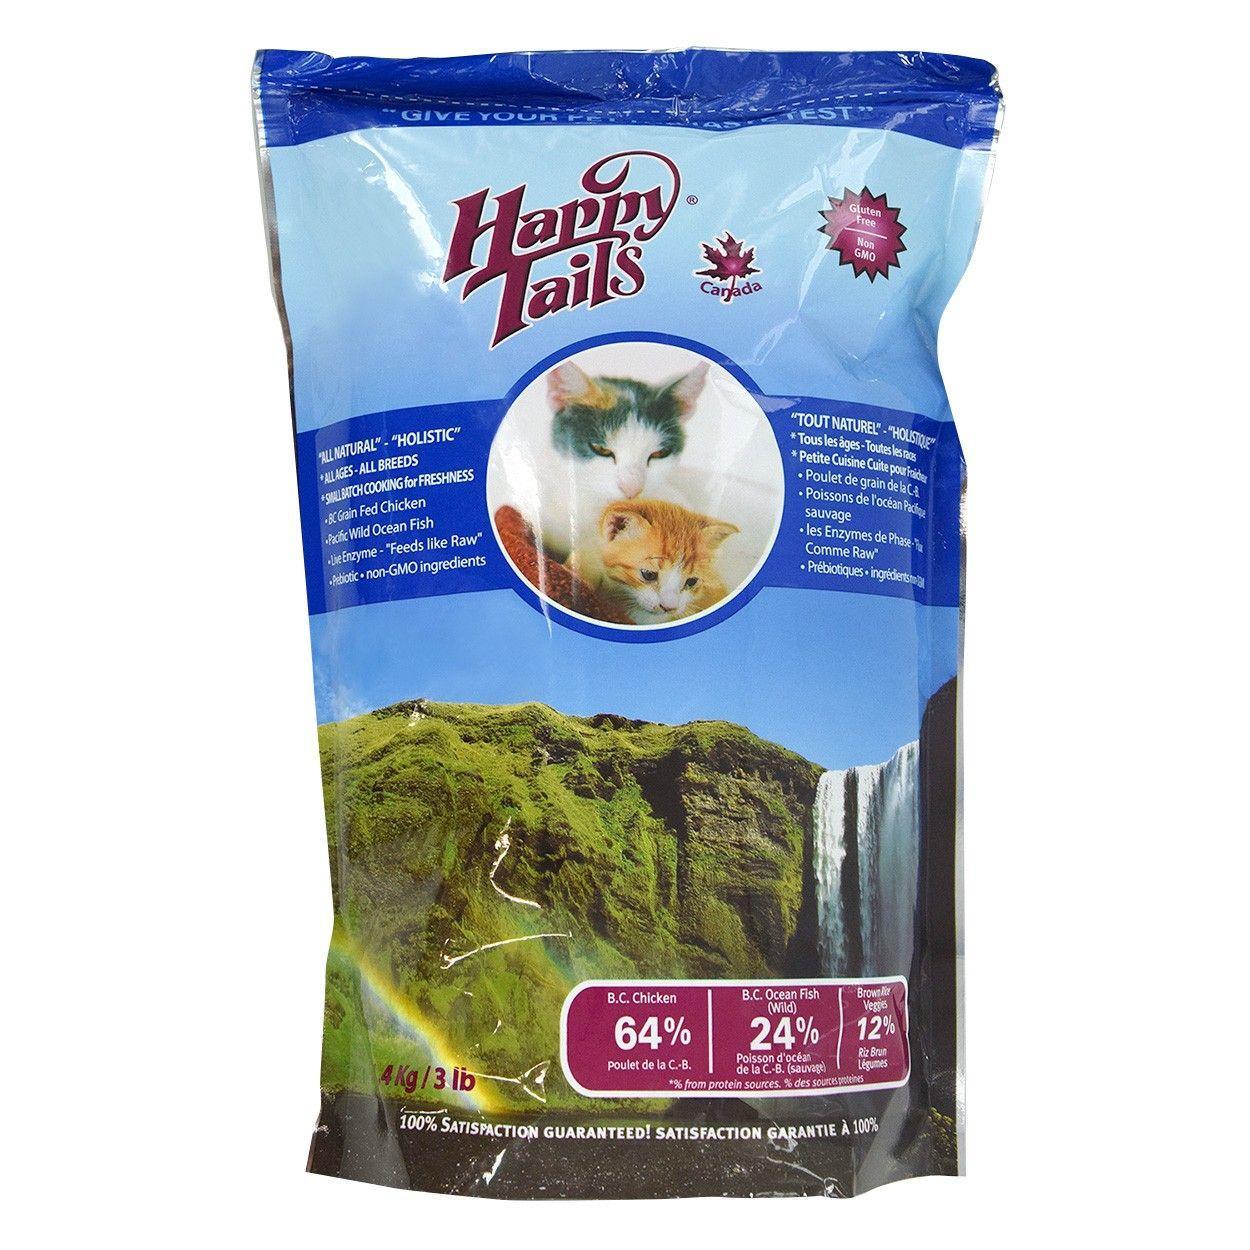 Happy Tails Holistic Dry Cat Food, 16.5-lb